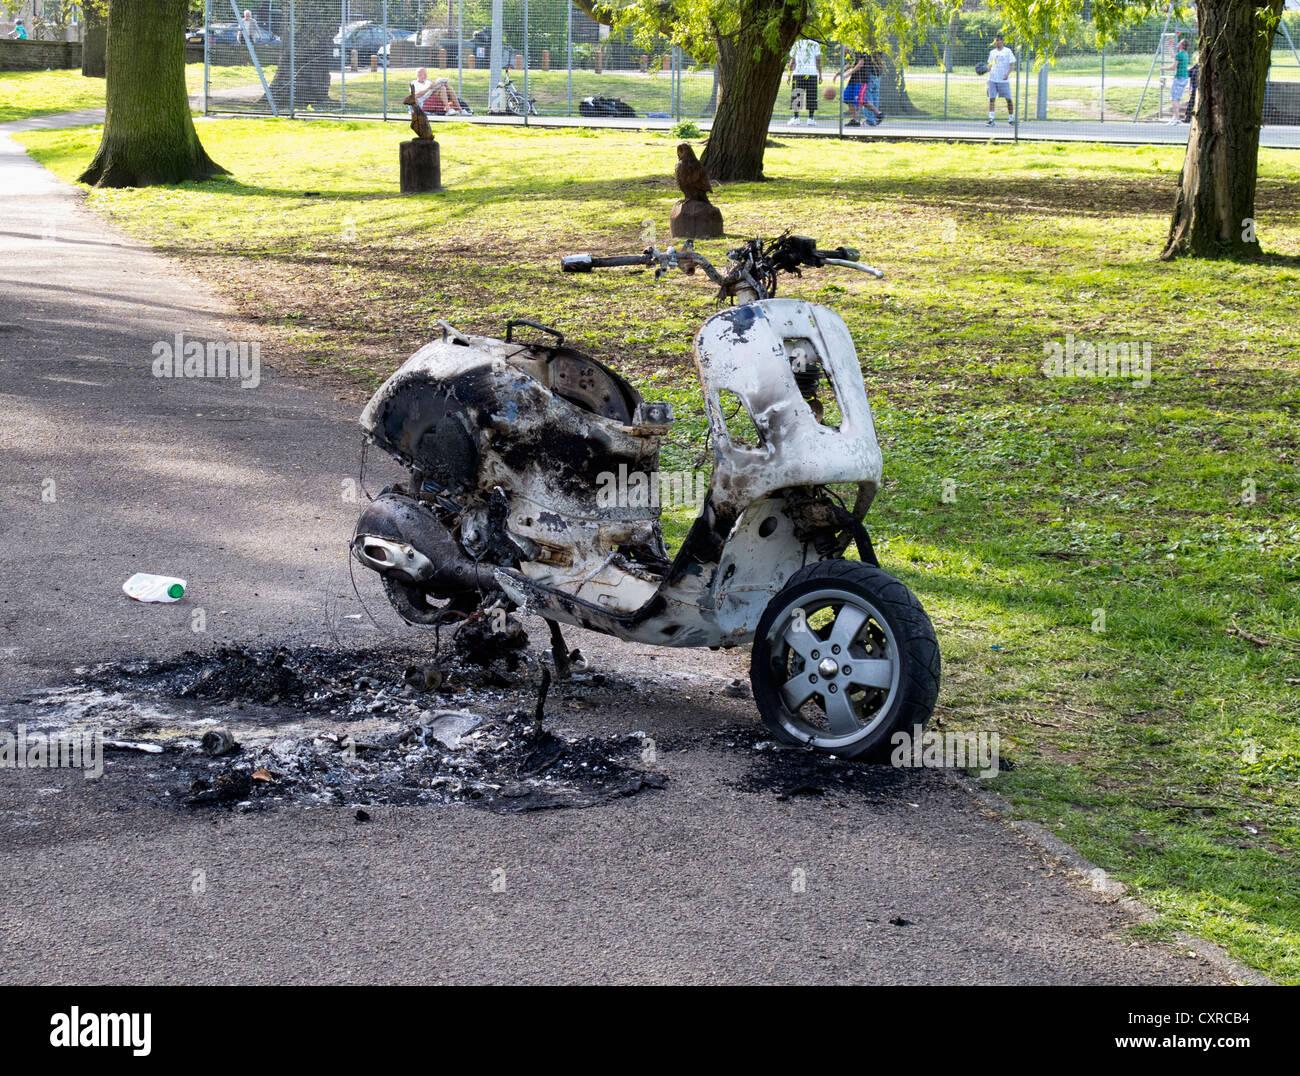 Burnt scooter - vandalism in Crane Park, Twickenham - Stock Image